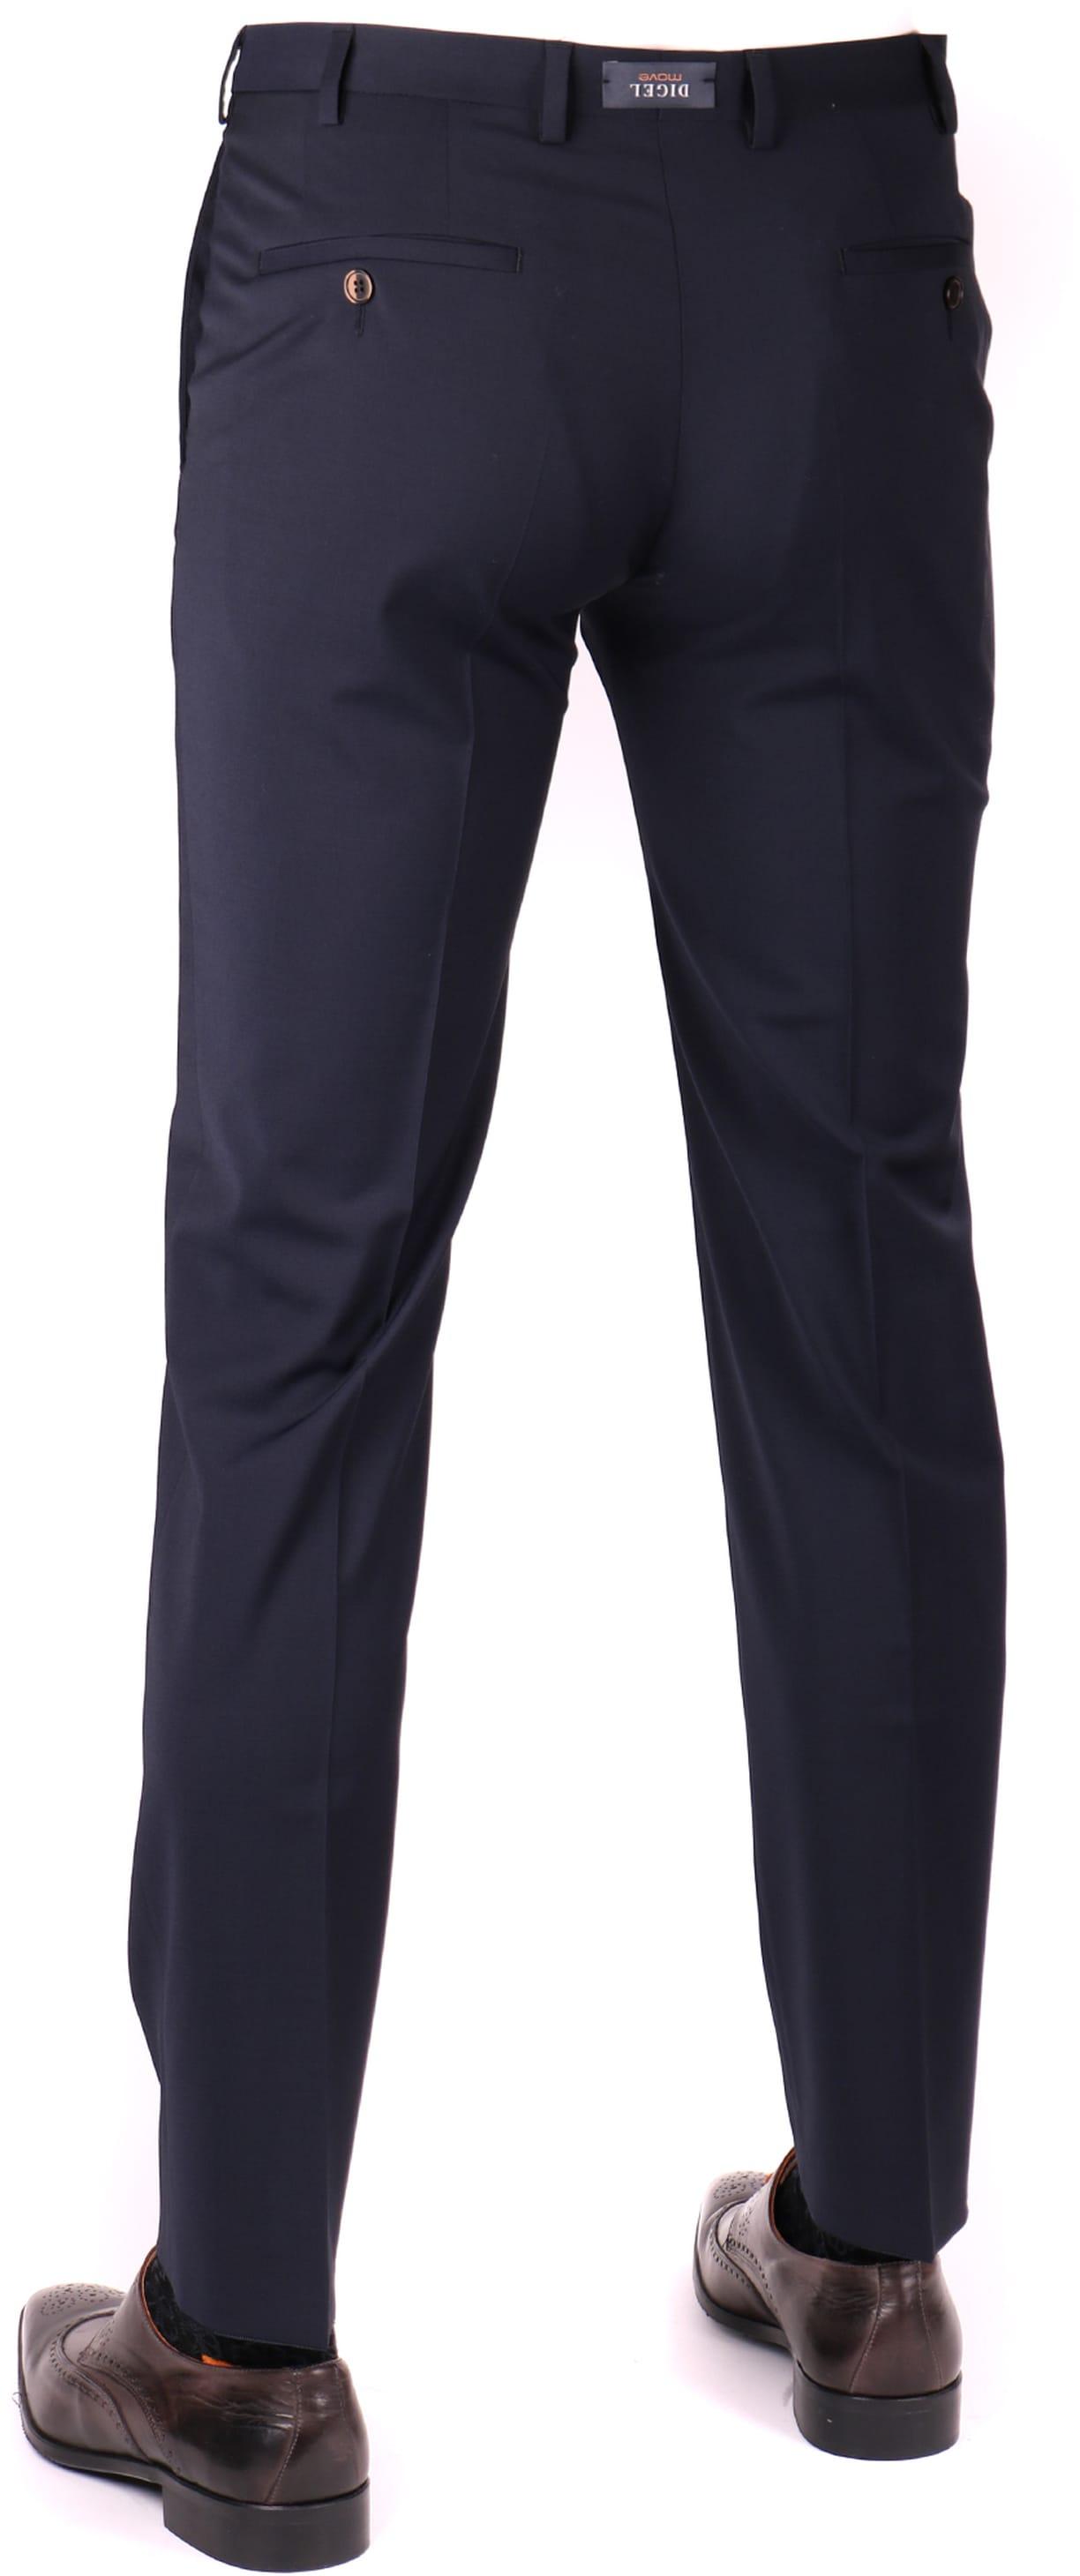 Digel Apollo Pantalon Donkerblauw Stretch foto 1